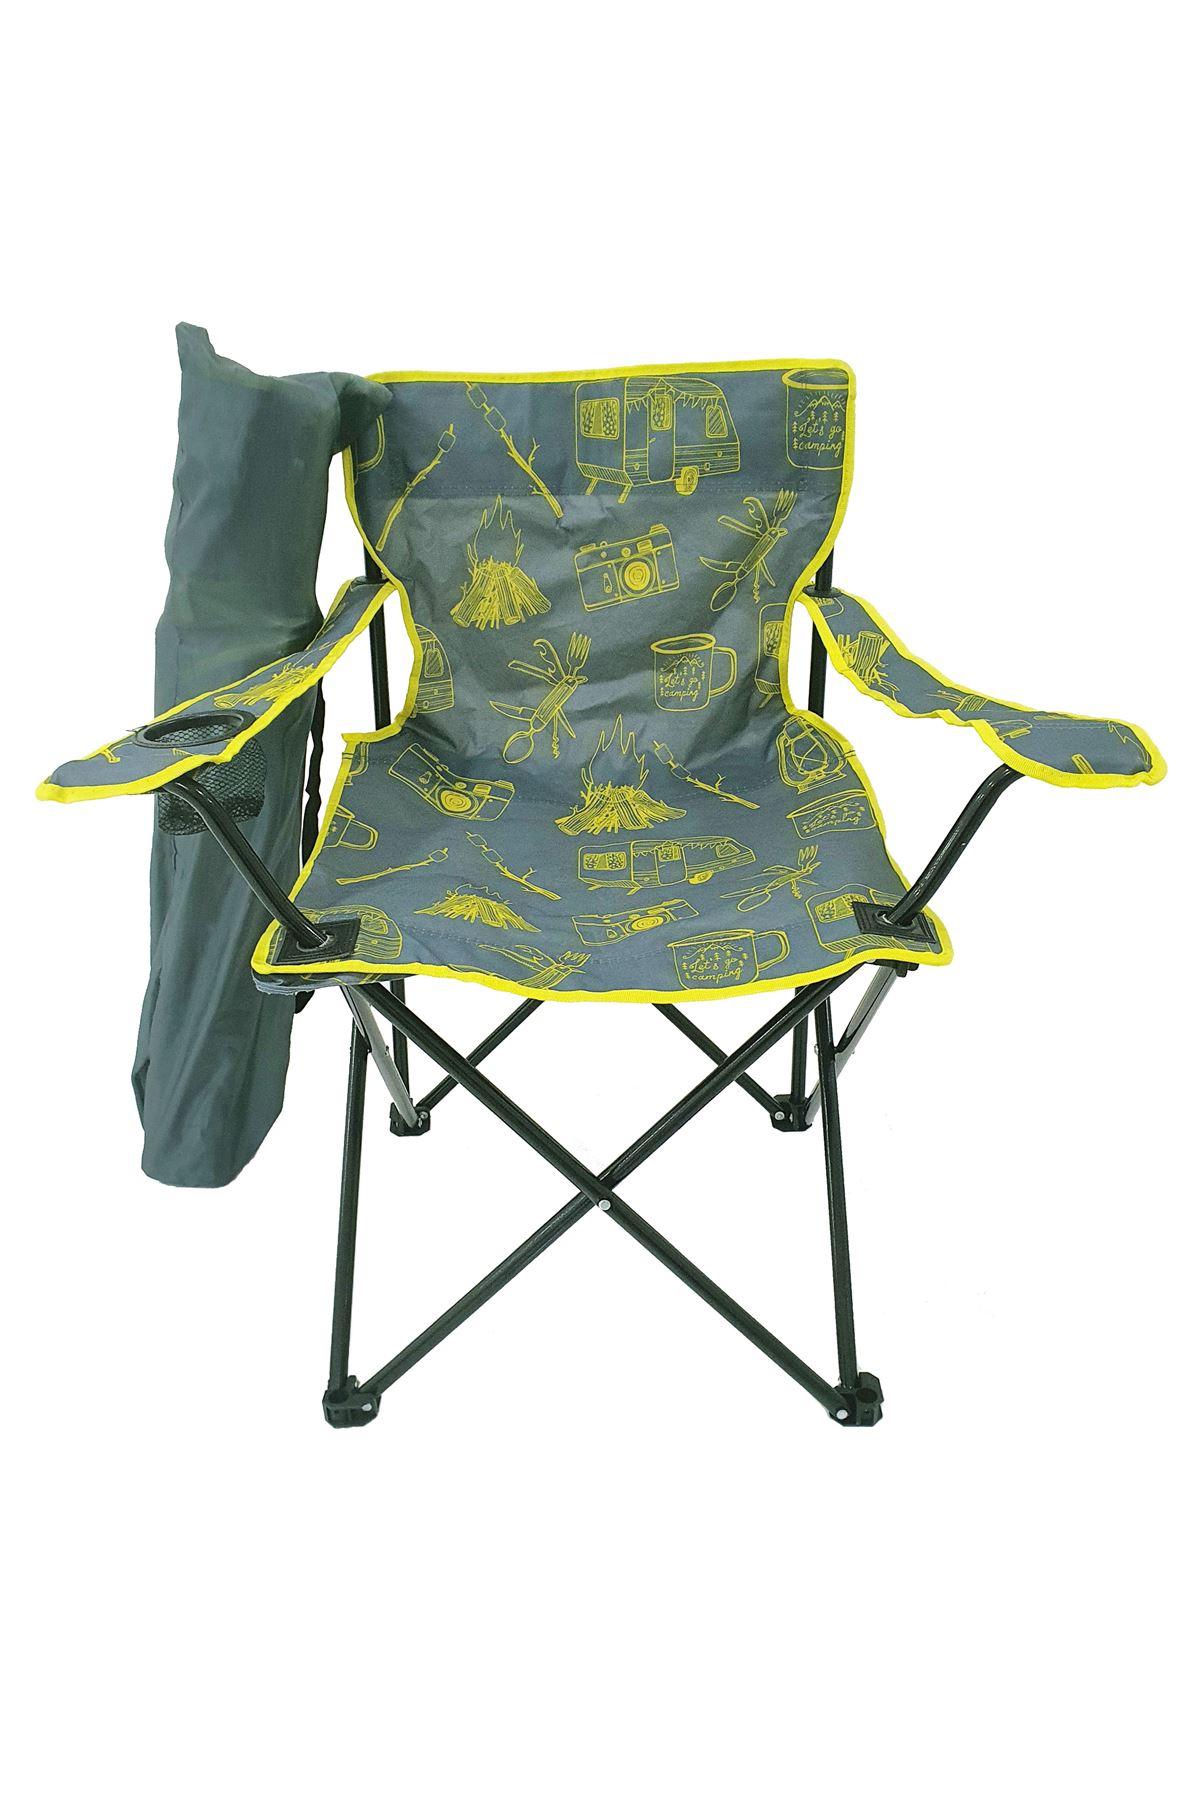 Bofigo Camping Chair Folding Chair Garden Chair Picnic Beach Balcony Chair Patterned Gray